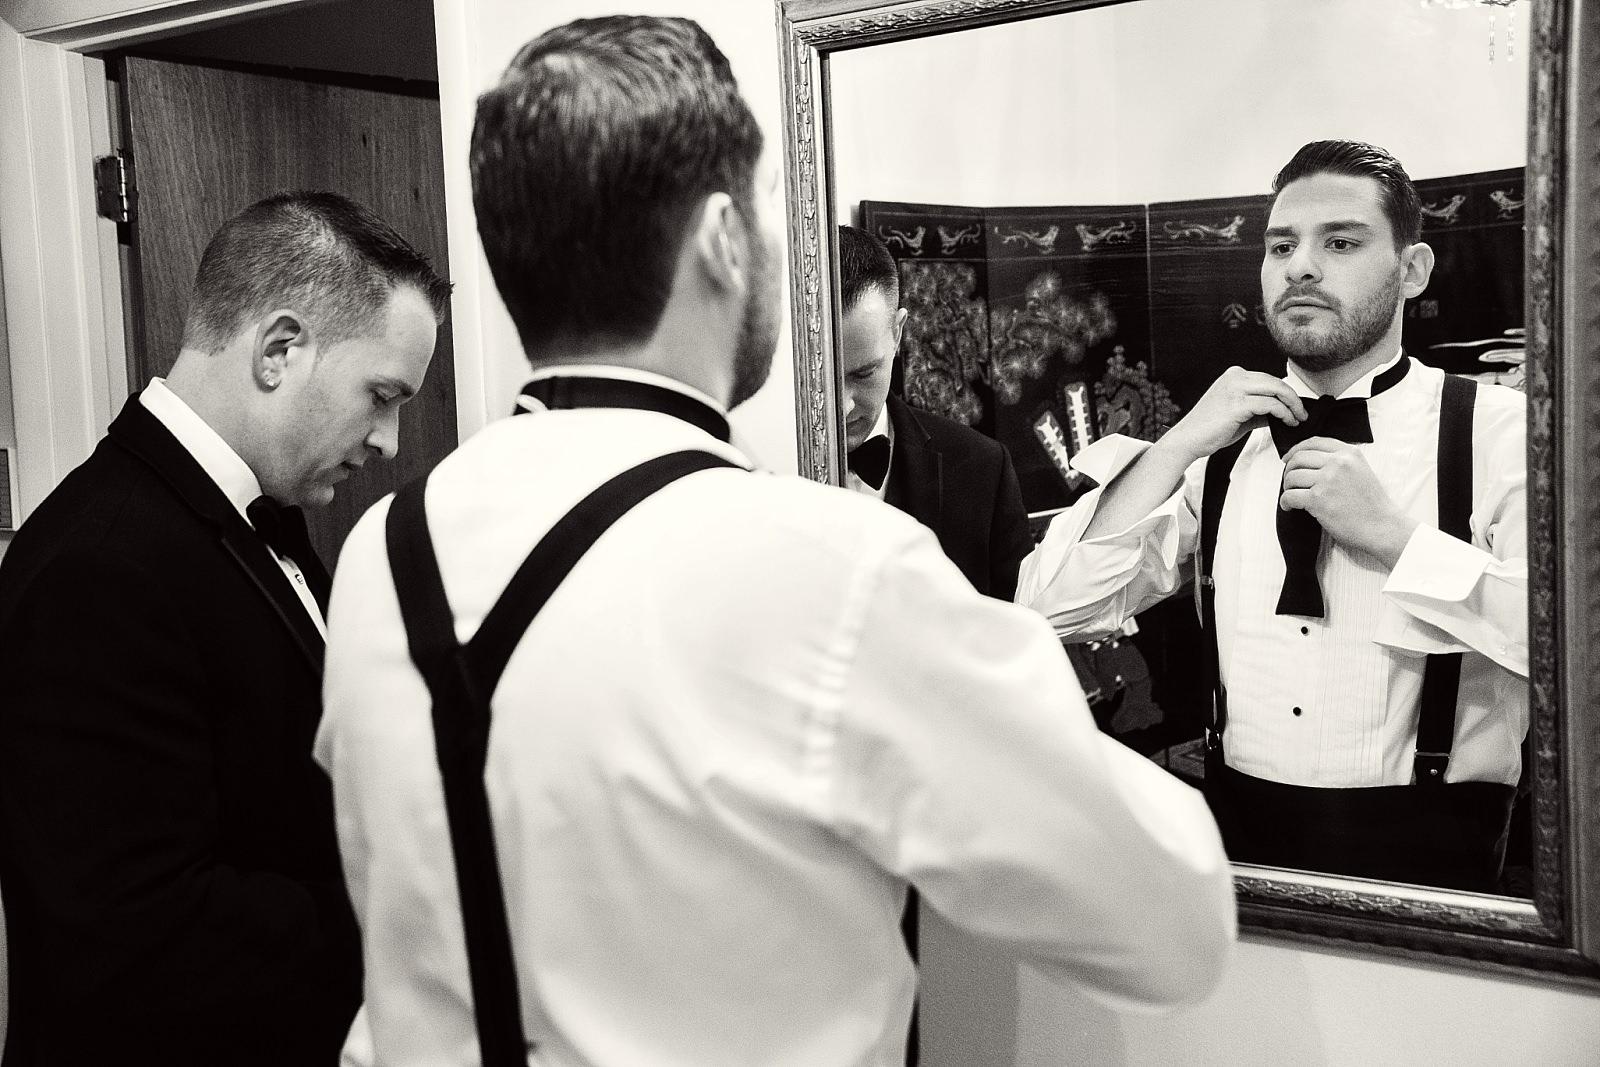 NY_Wedding_Photographer_NiPe_03.jpg